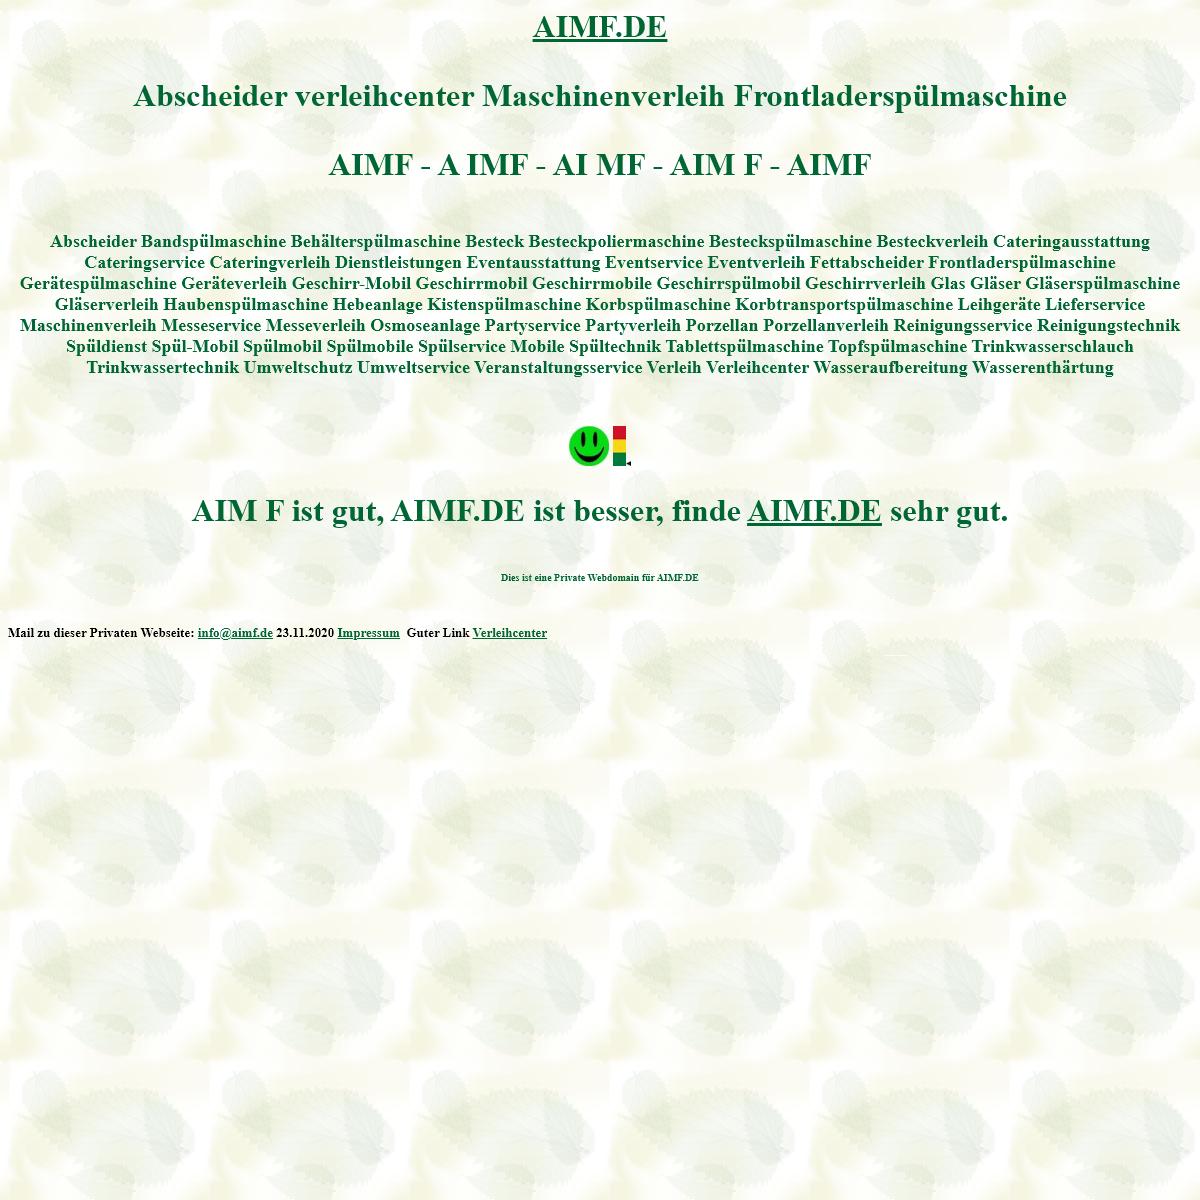 aimf Abscheider verleihcenter Maschinenverleih Frontladerspülmaschine Spülmobil Verleih Geschirrmobil Mieten